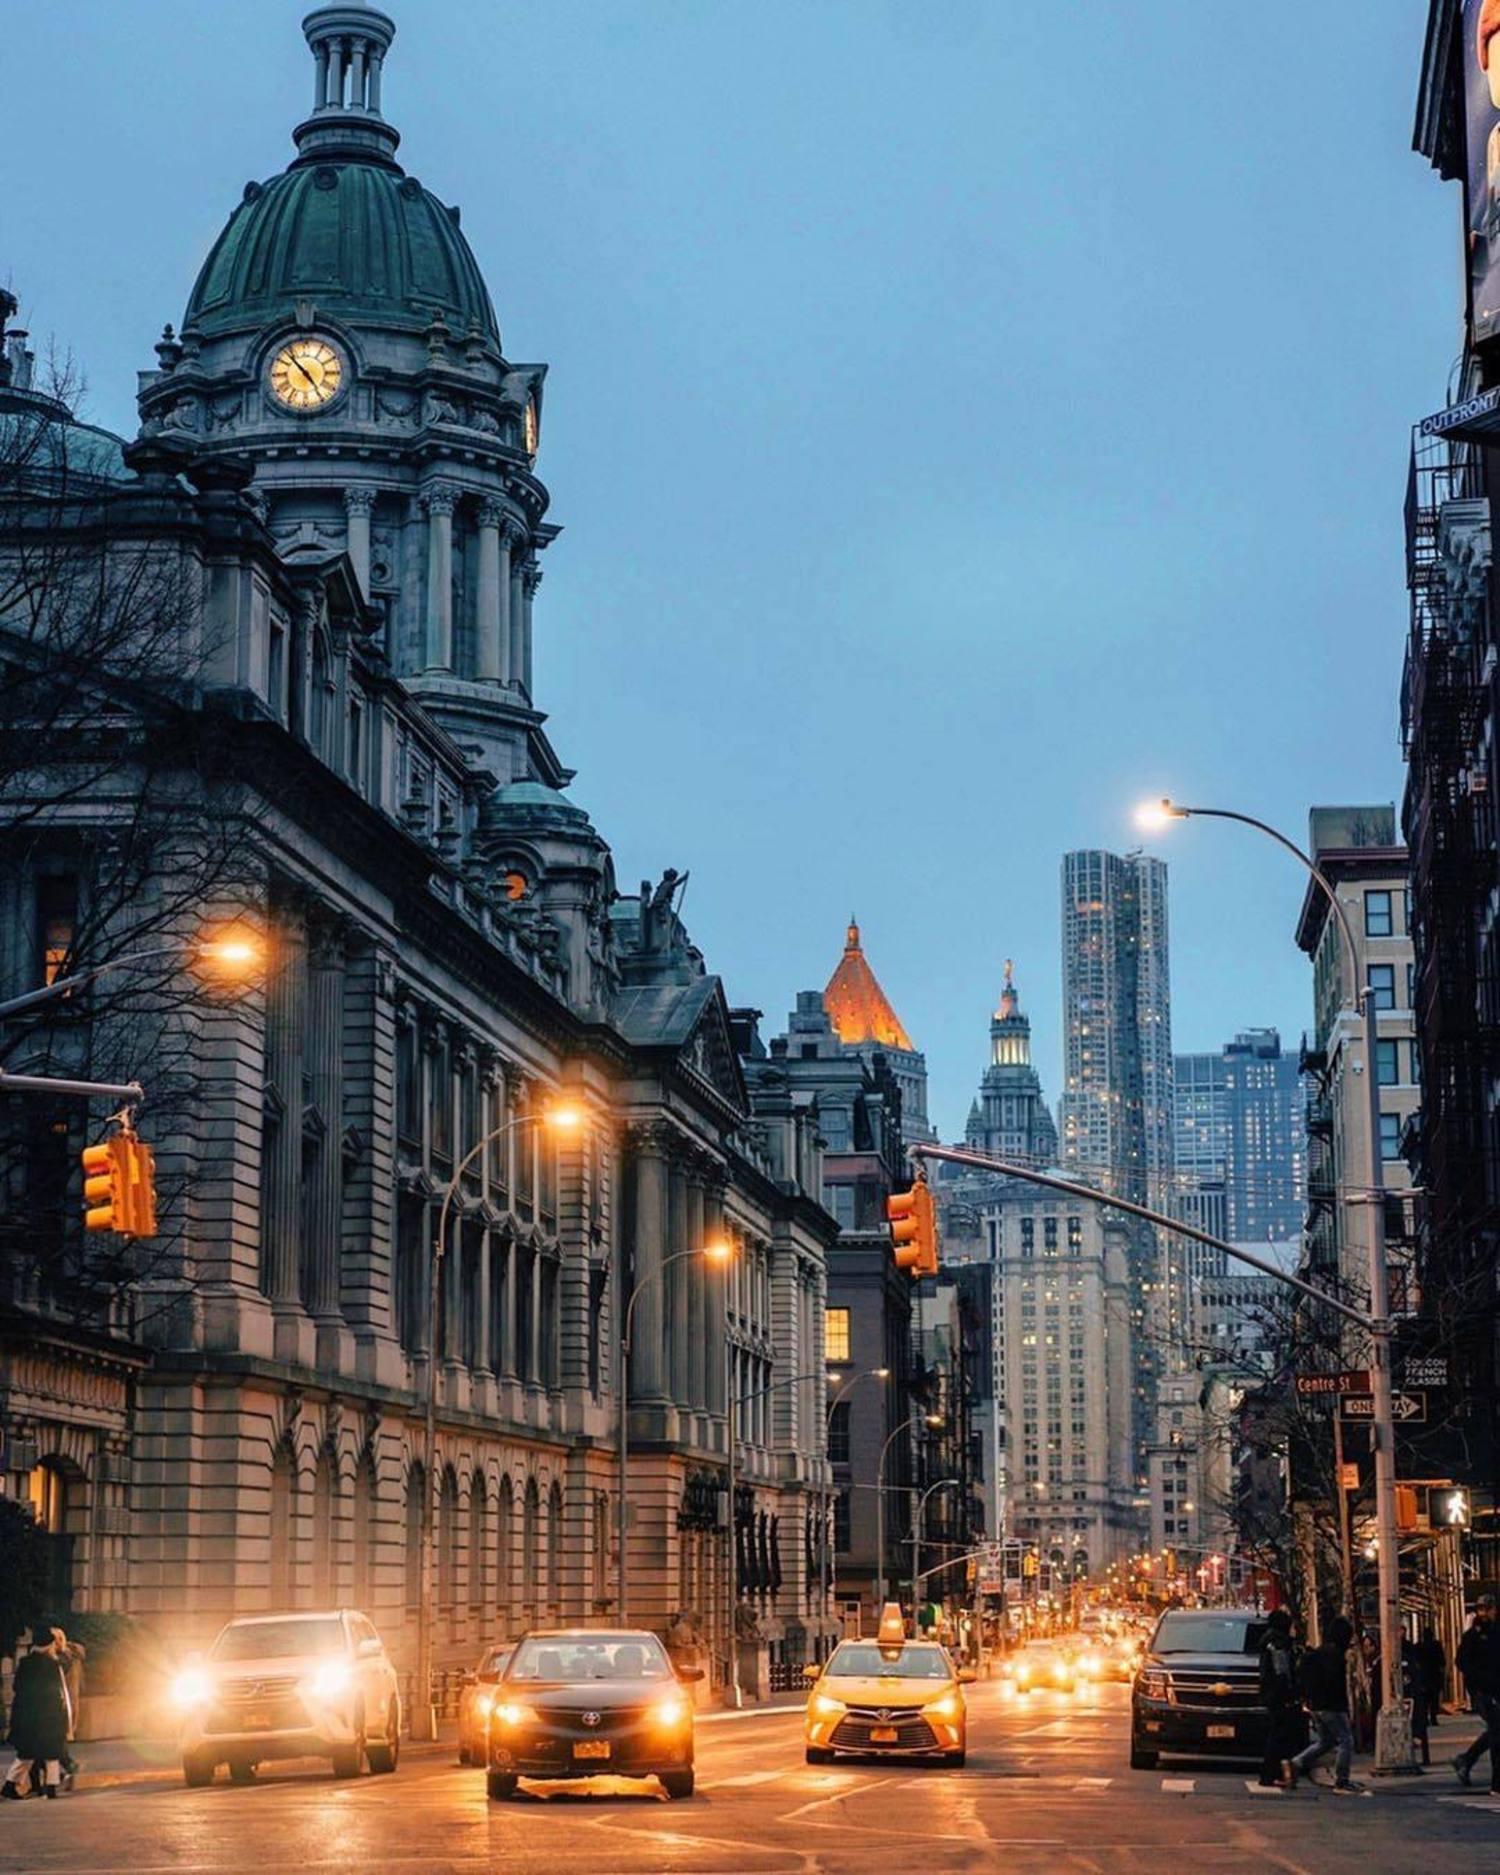 SoHo, Manhattan. Photo via @joethommas #viewingnyc #nyc #newyork #newyorkcity